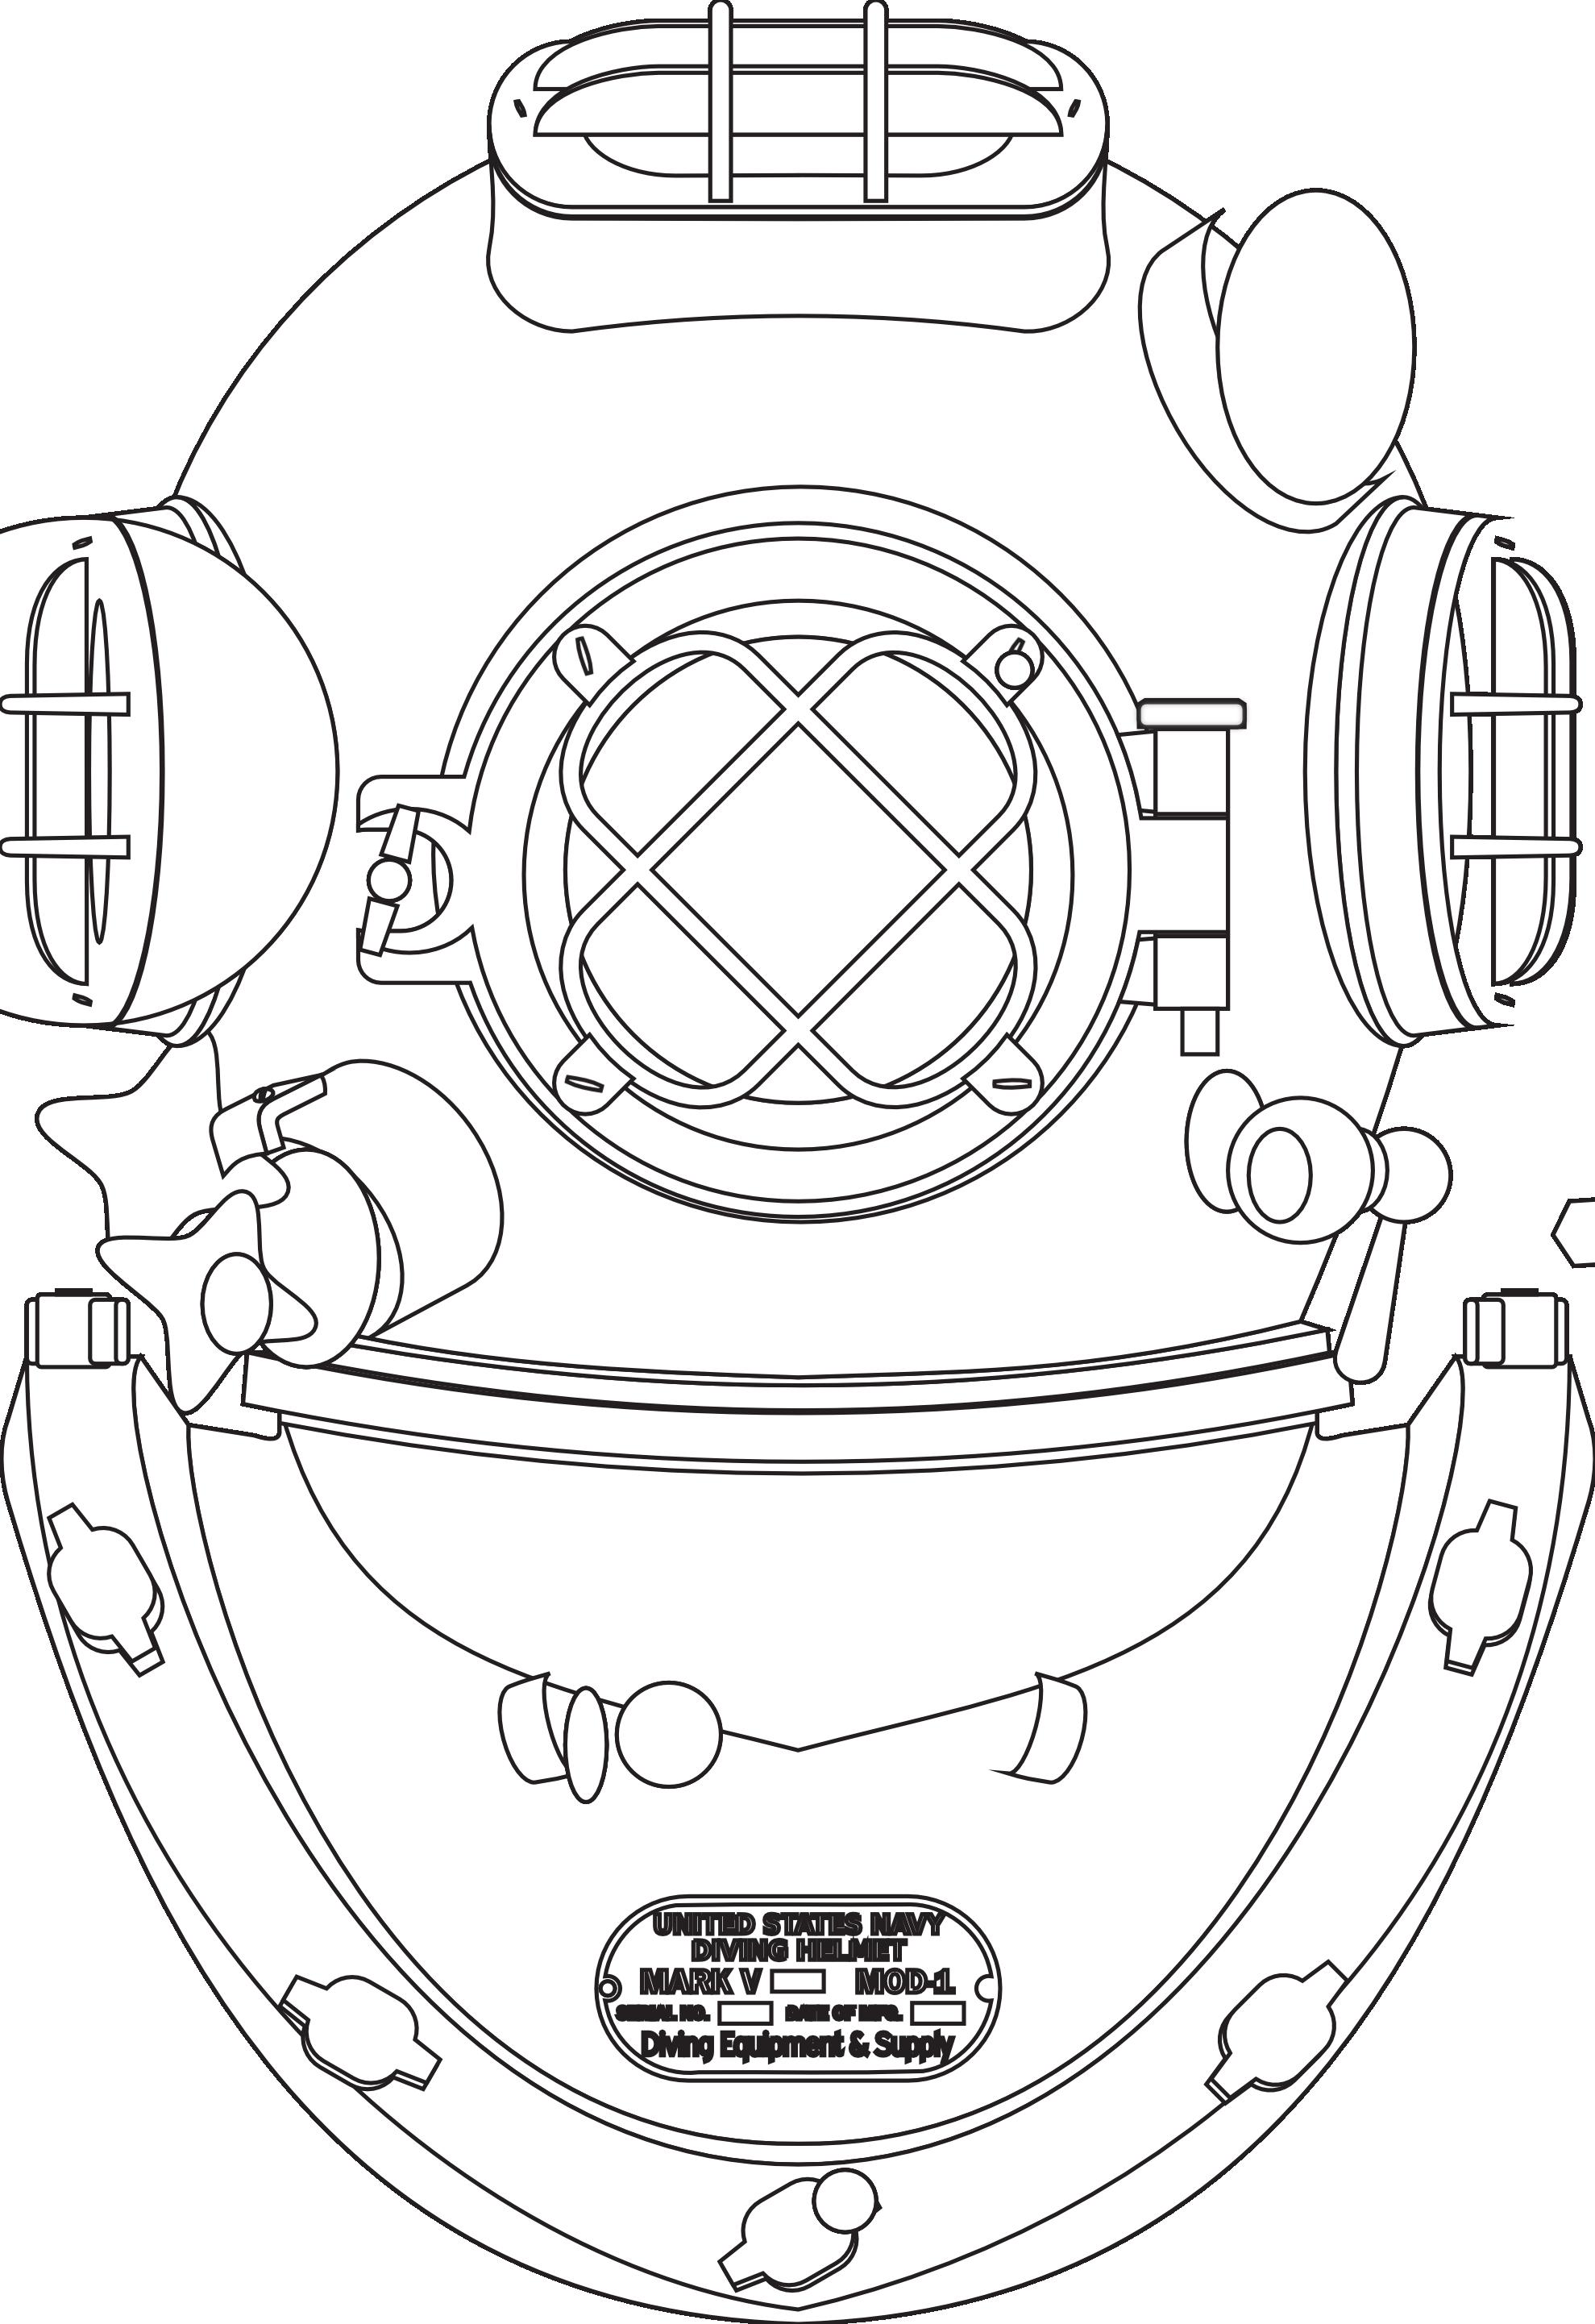 casco palombaro diving helmet hunky dory SVG colouringbook.org.